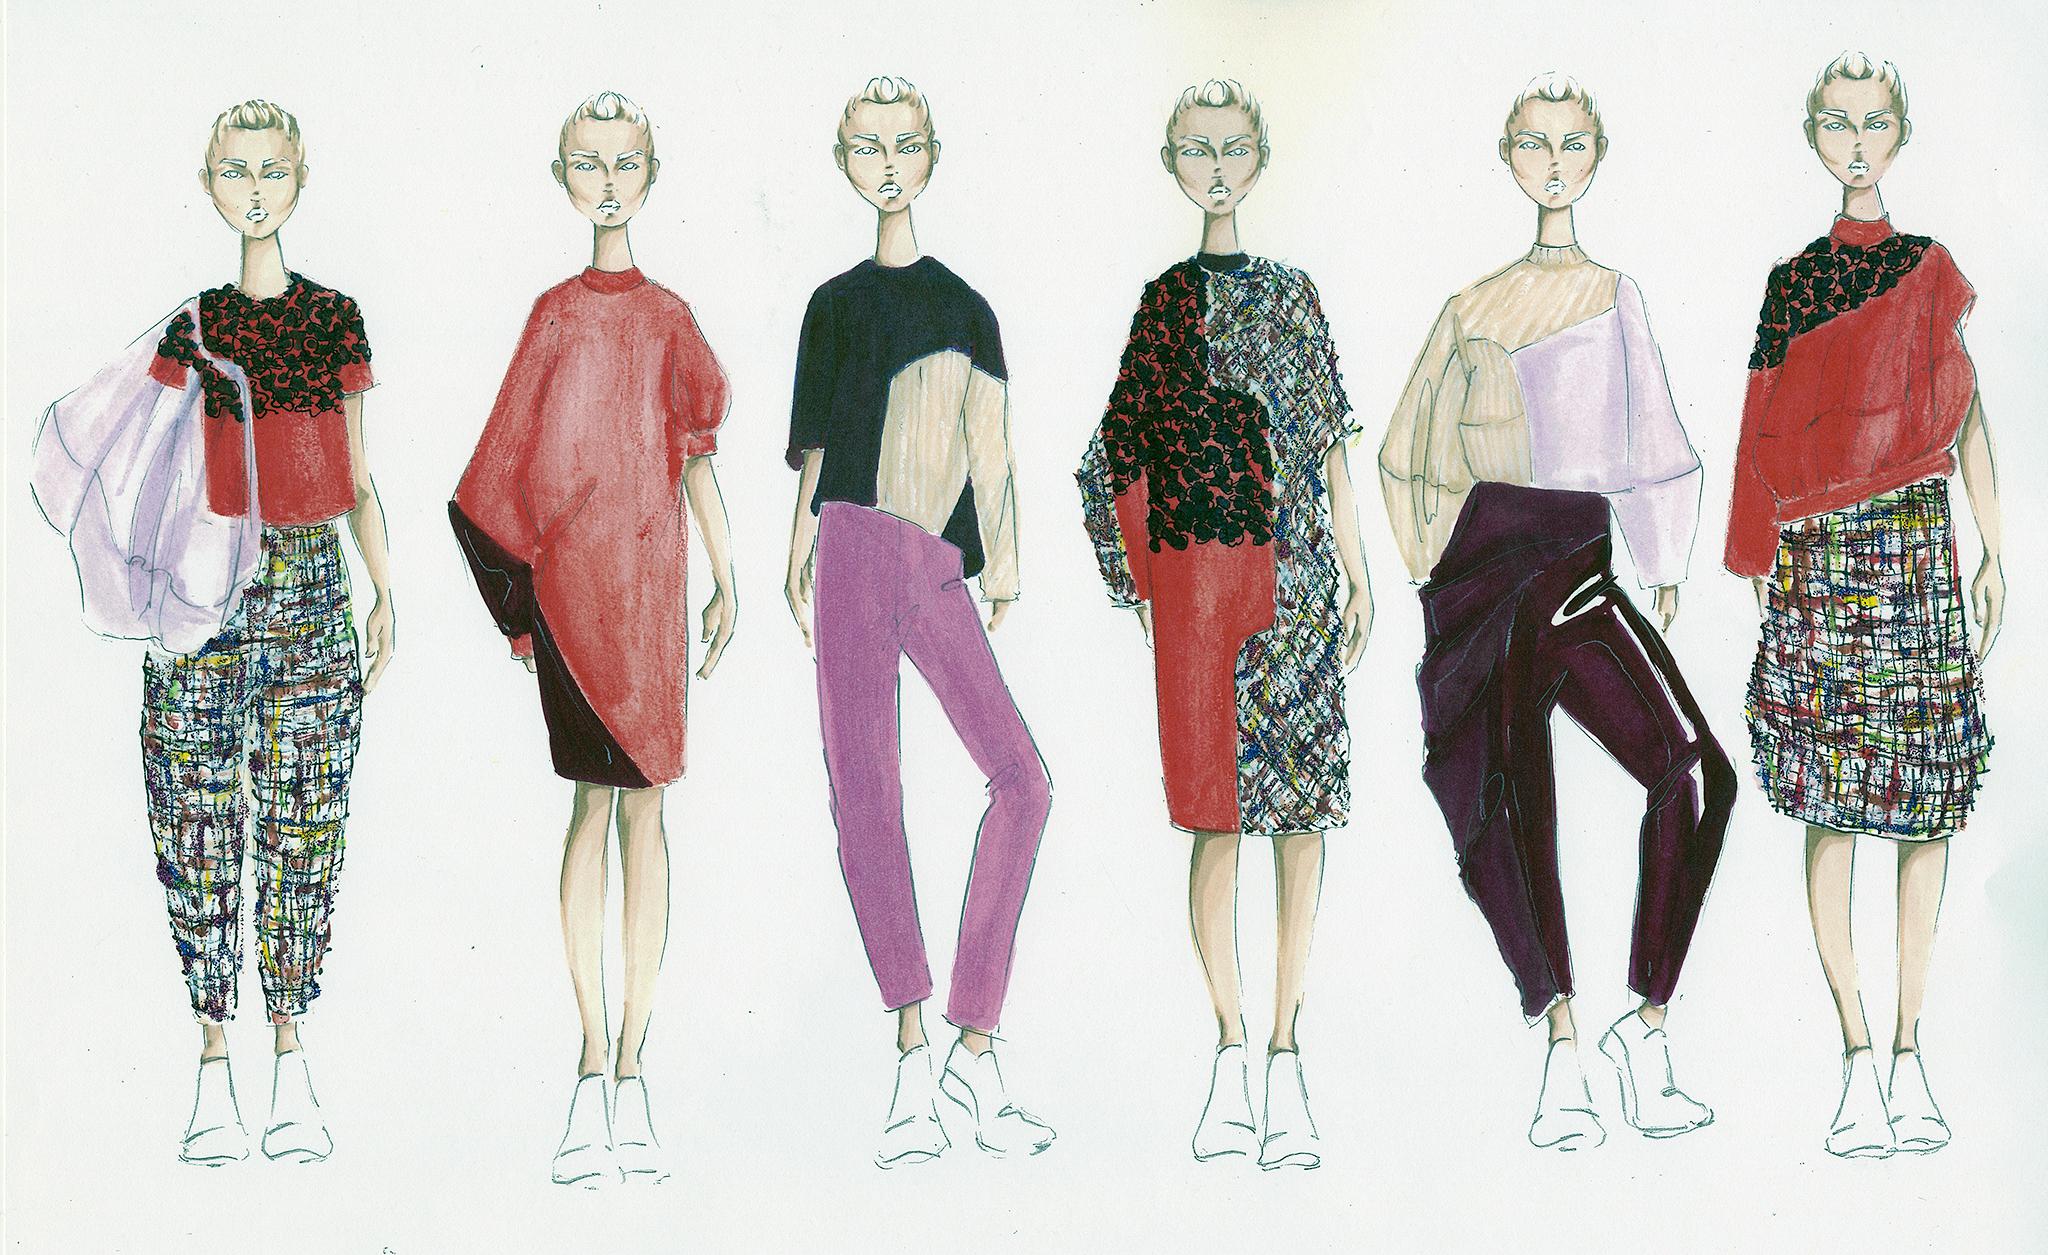 16a-Celine-Sohrabian-Lineup